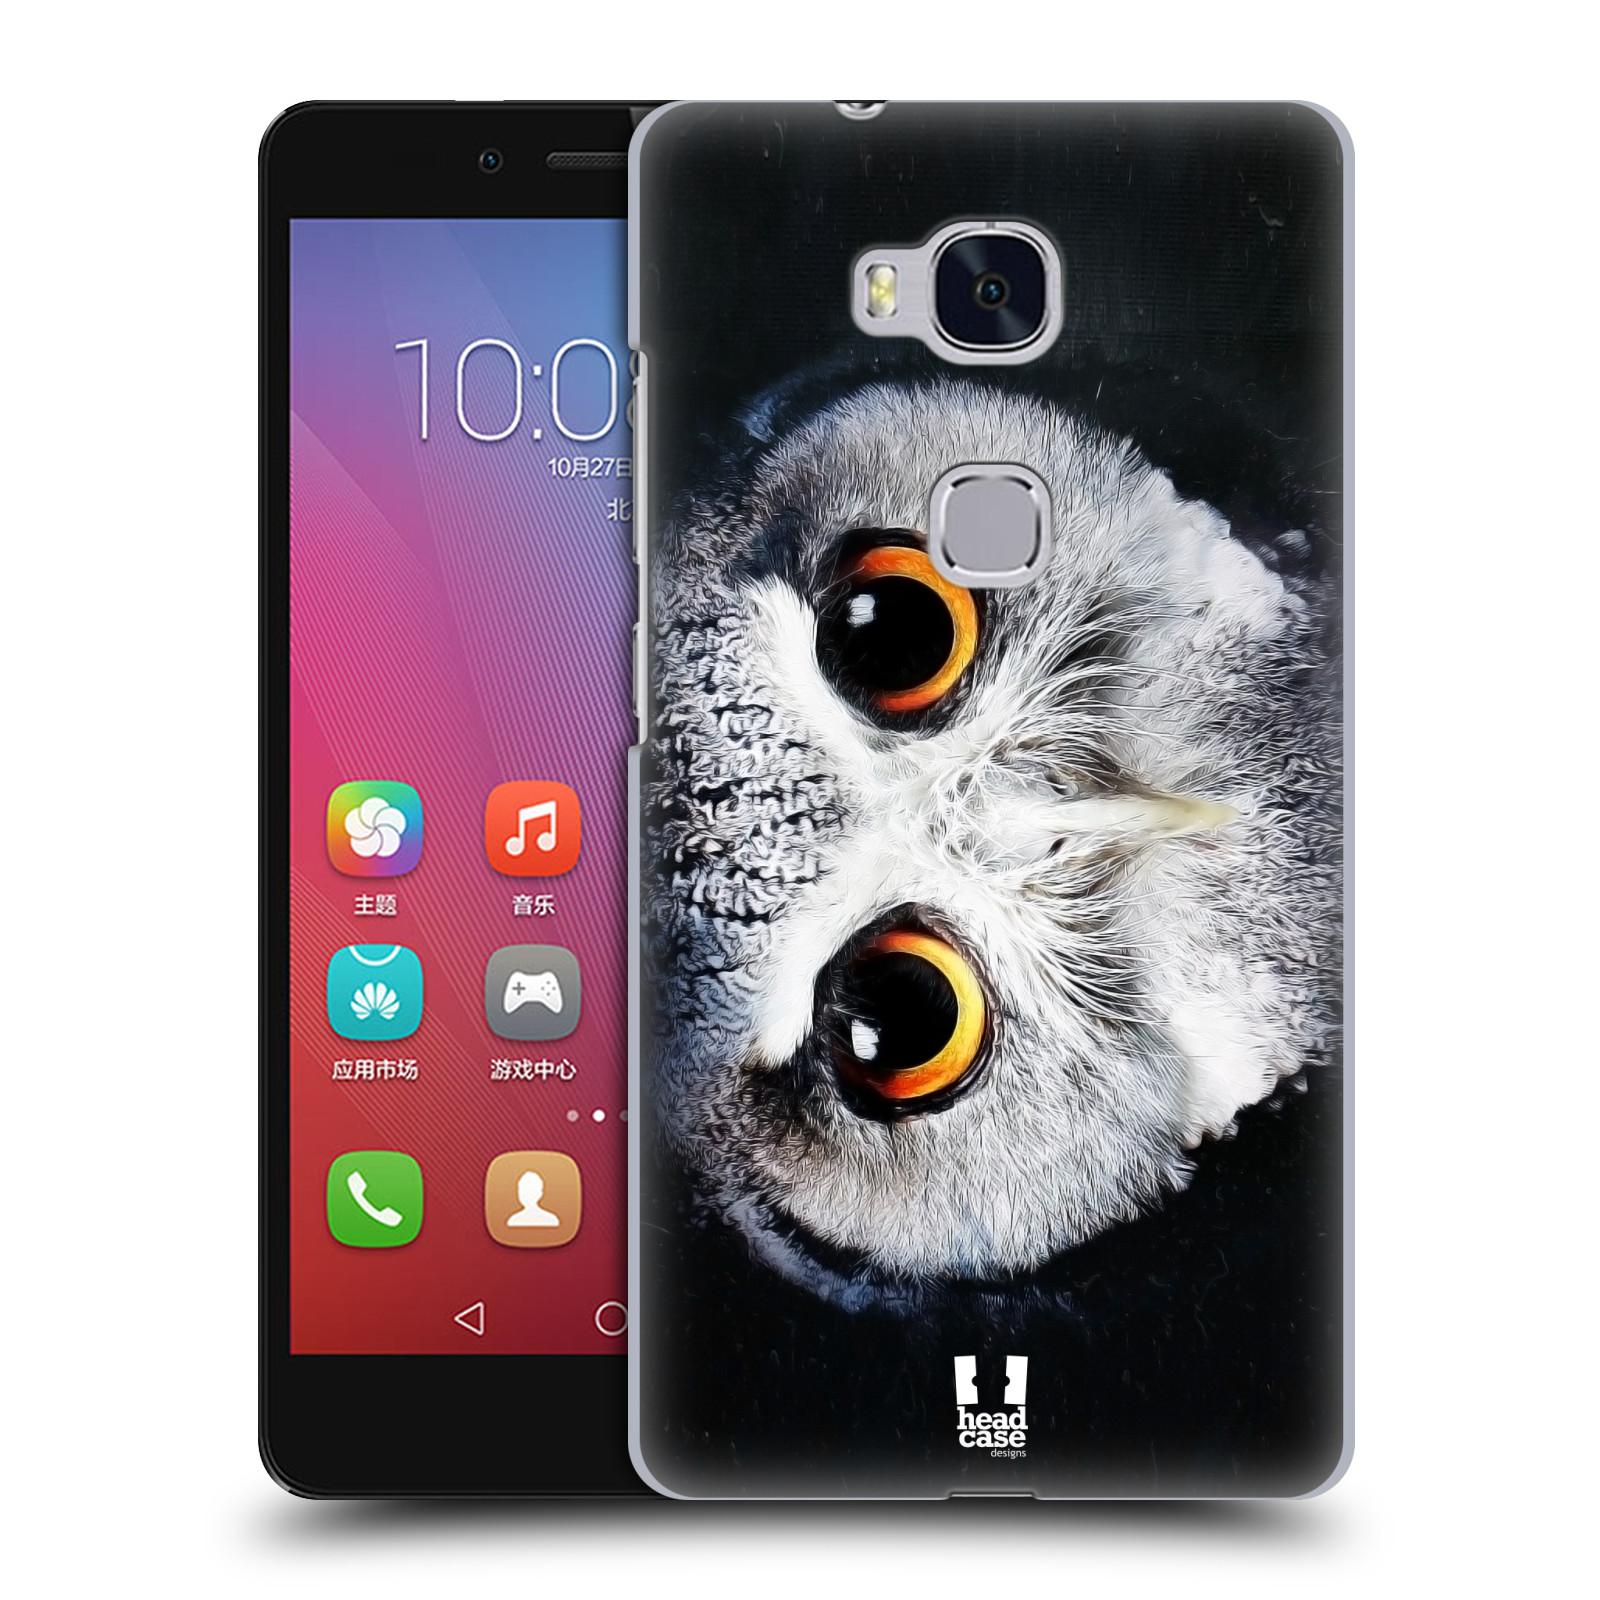 HEAD CASE pevný plastový obal na mobil HUAWEI HONOR 5X vzor Zvířecí tváře sova